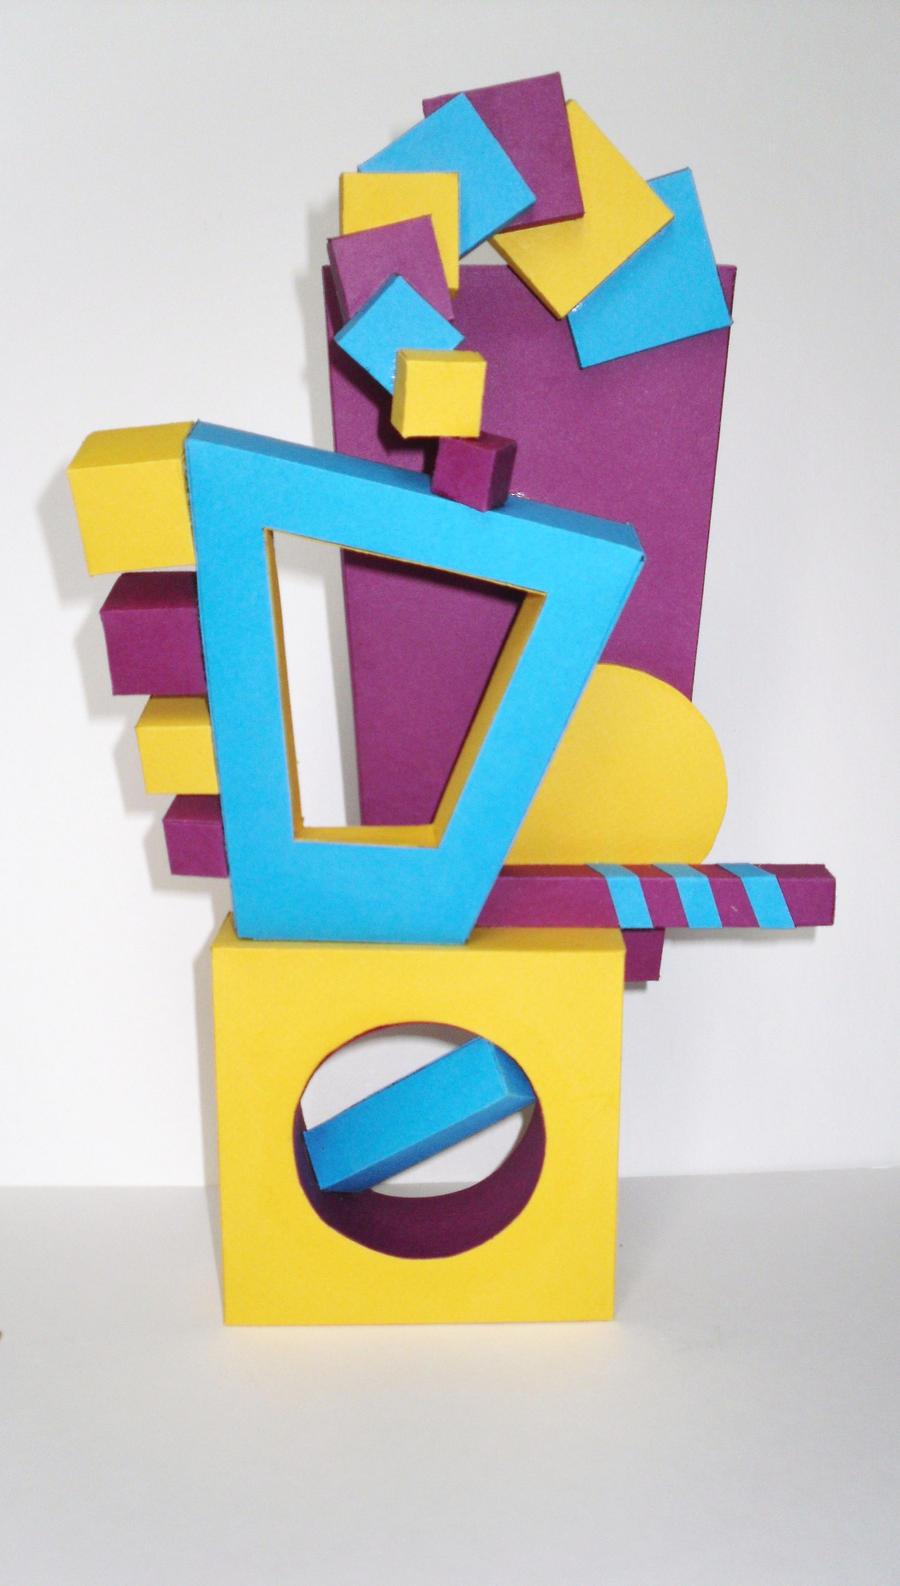 paper cubism art by jgladys on paper cubism art by jgladys5 paper cubism art by jgladys5